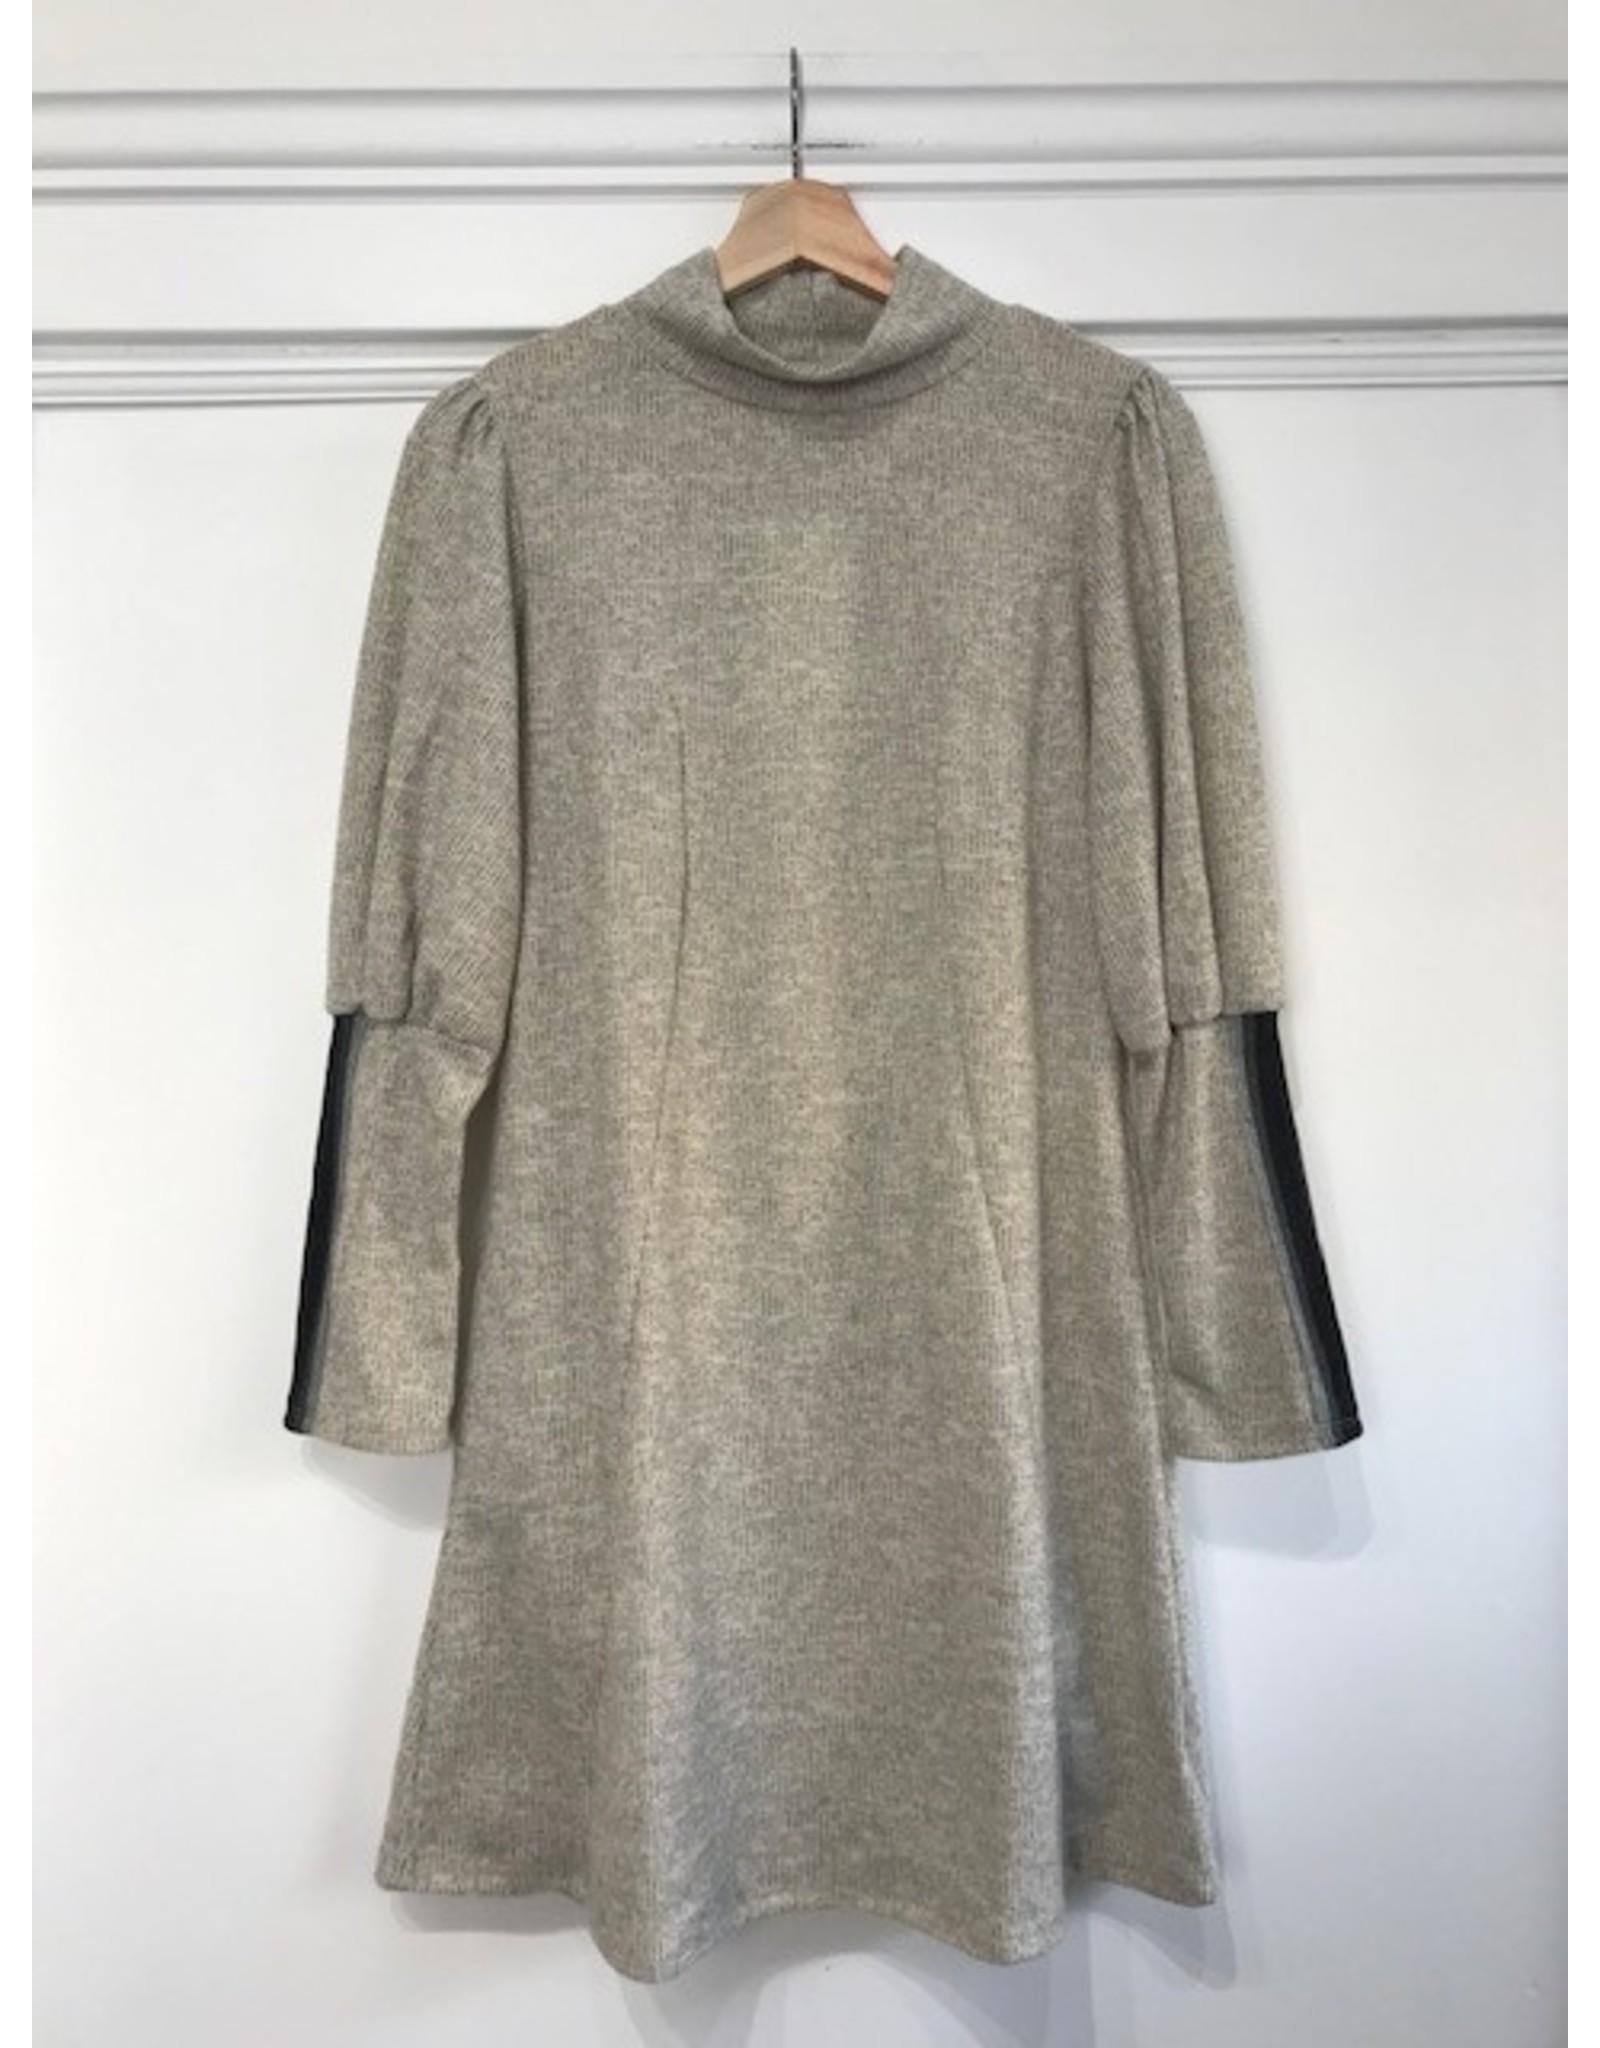 Papillon Papillon - Mock neck sweater dress